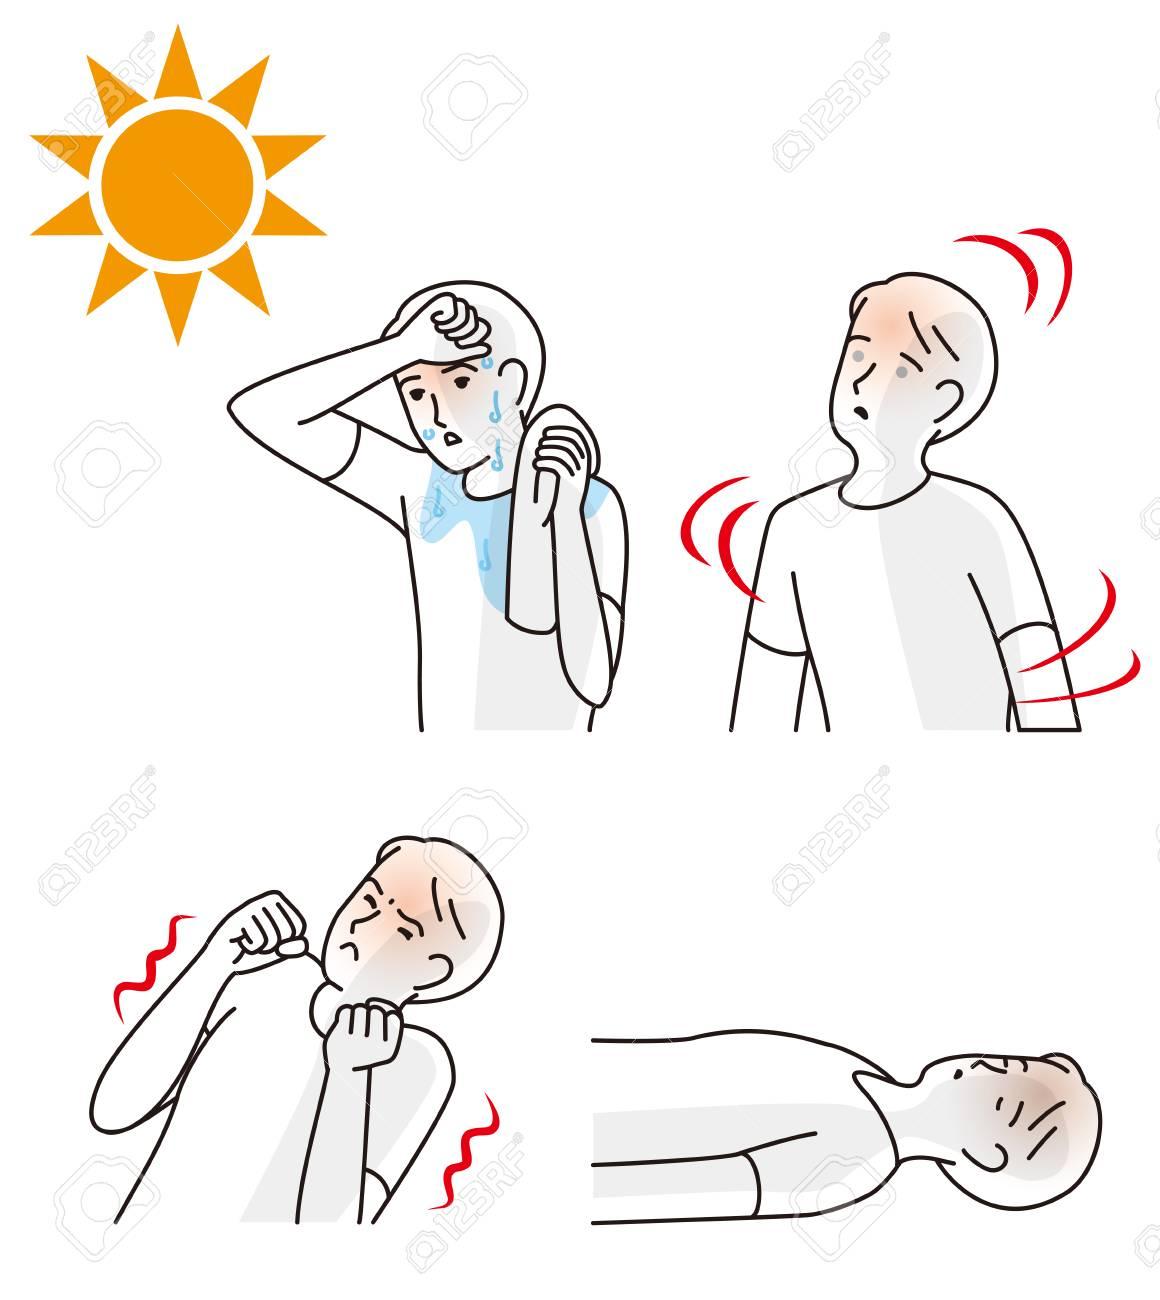 Symptoms of heat stroke illustration. - 100670590